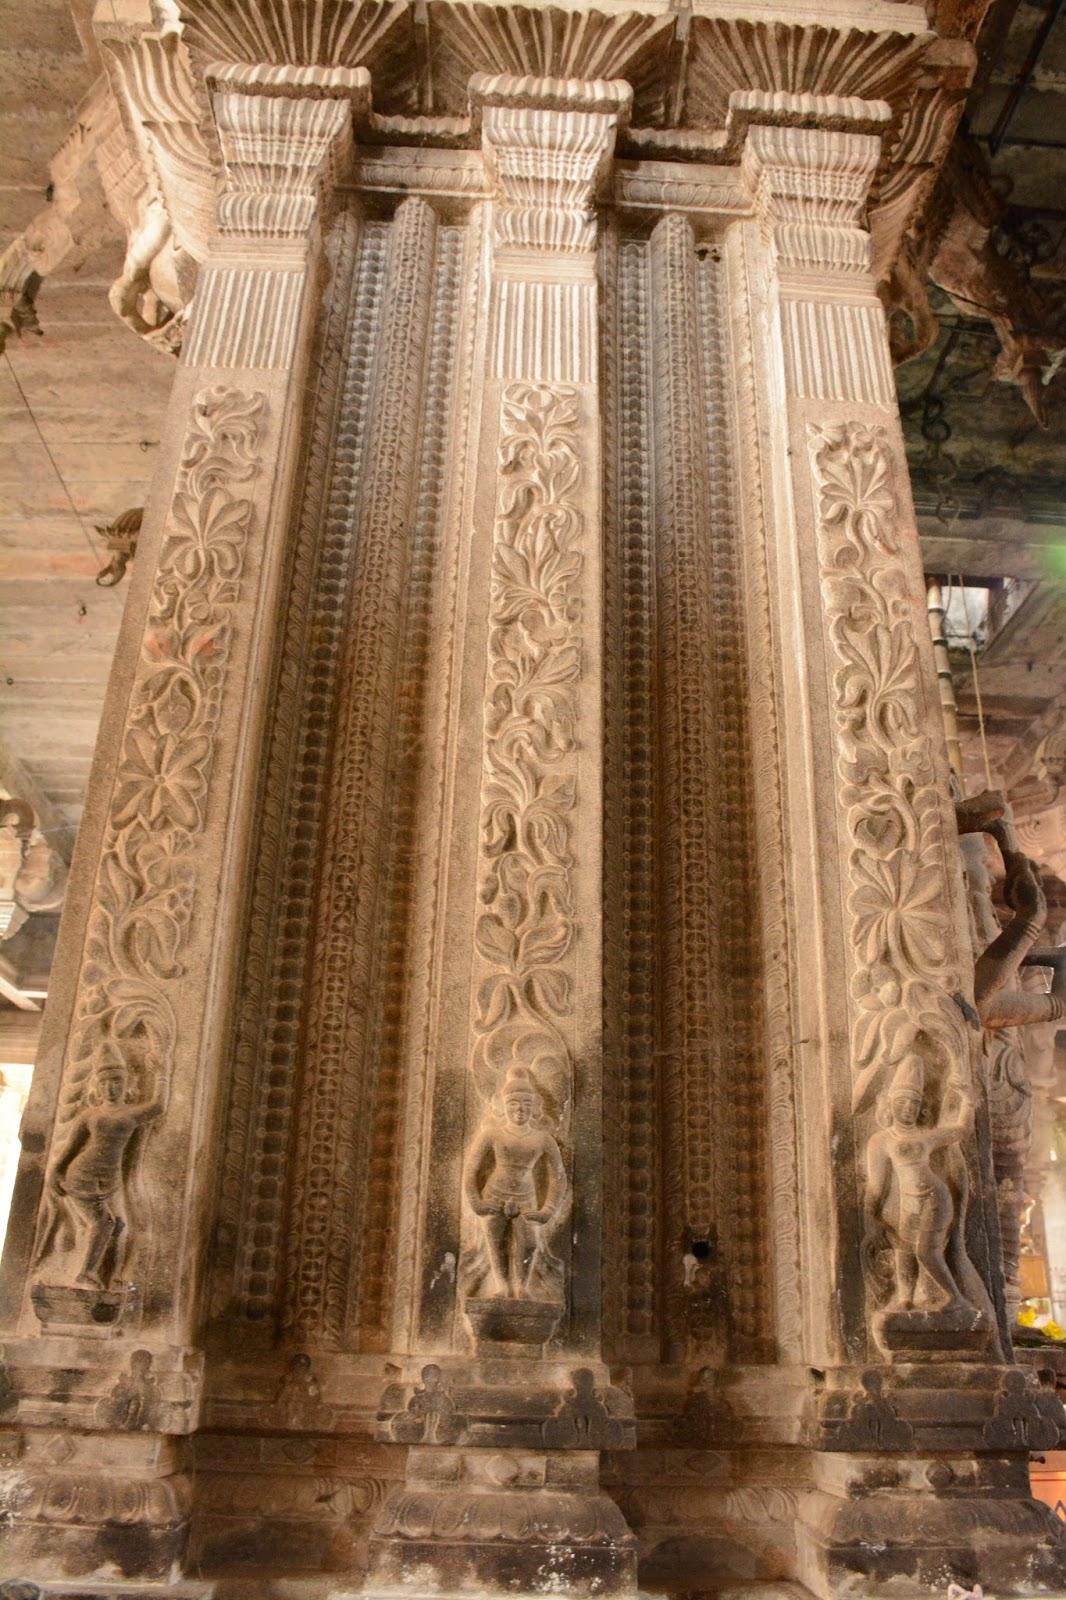 Tamilnadu Tourism Jambukeswarar Temple Thiruvanaikaval Trichy